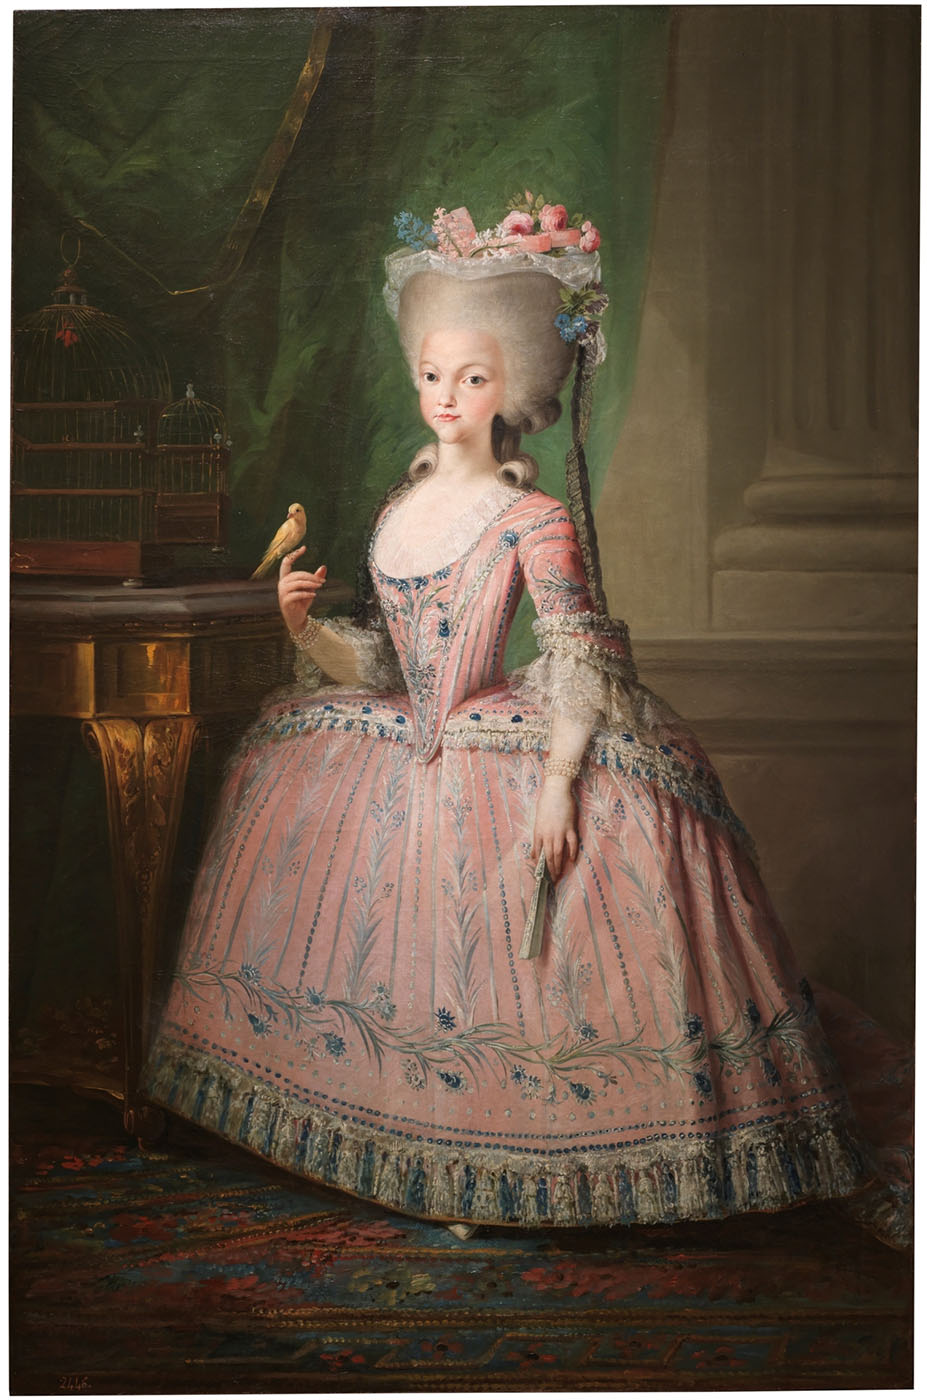 Mariano Salvador Maella. Carlota Joaquina, infanta de España, reina de Portuga. 1785. Museo Nacional del Prado. Madrid.